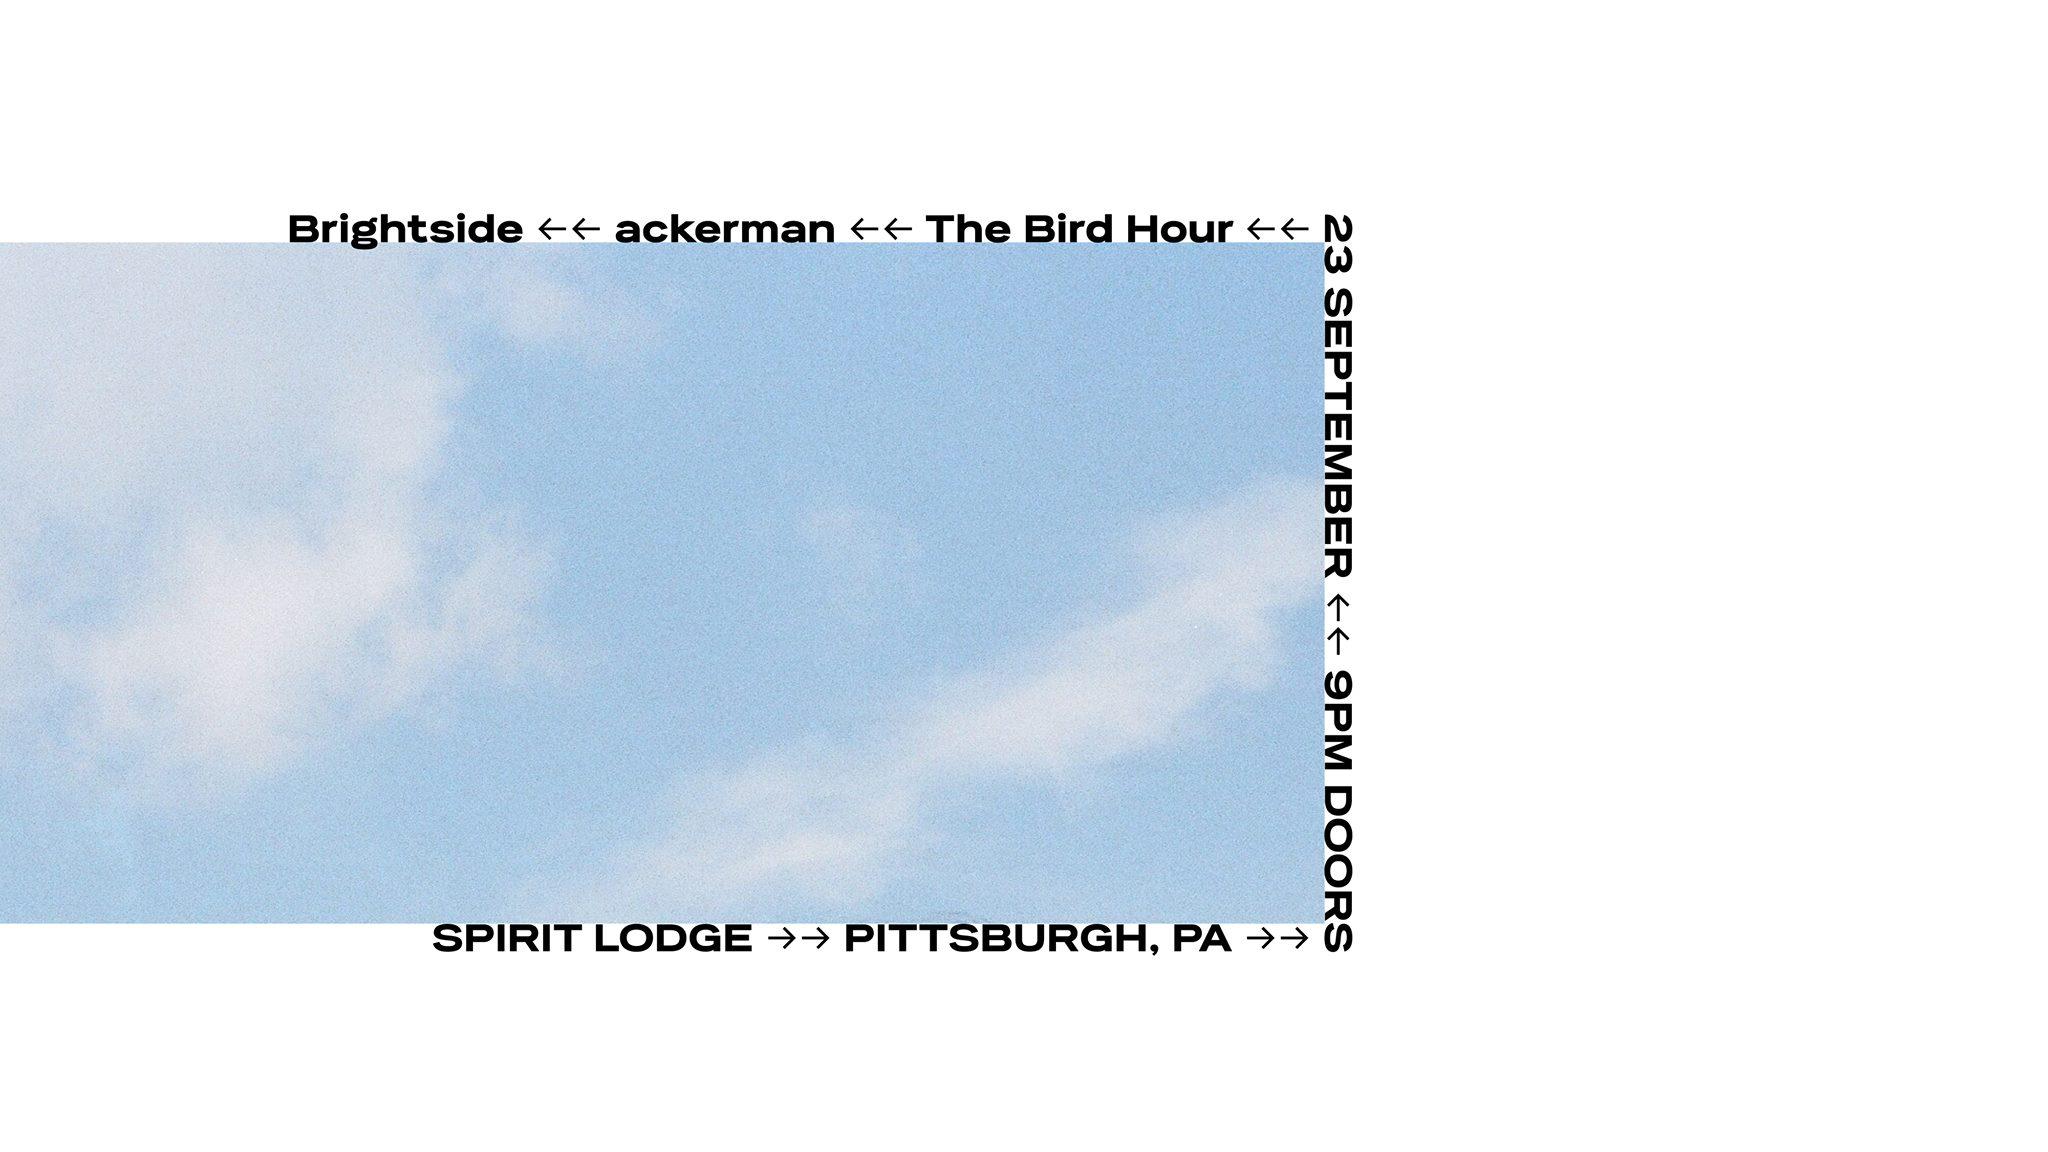 Lodge: Brightside / ackerman (NY) / The Bird Hour — Spirit